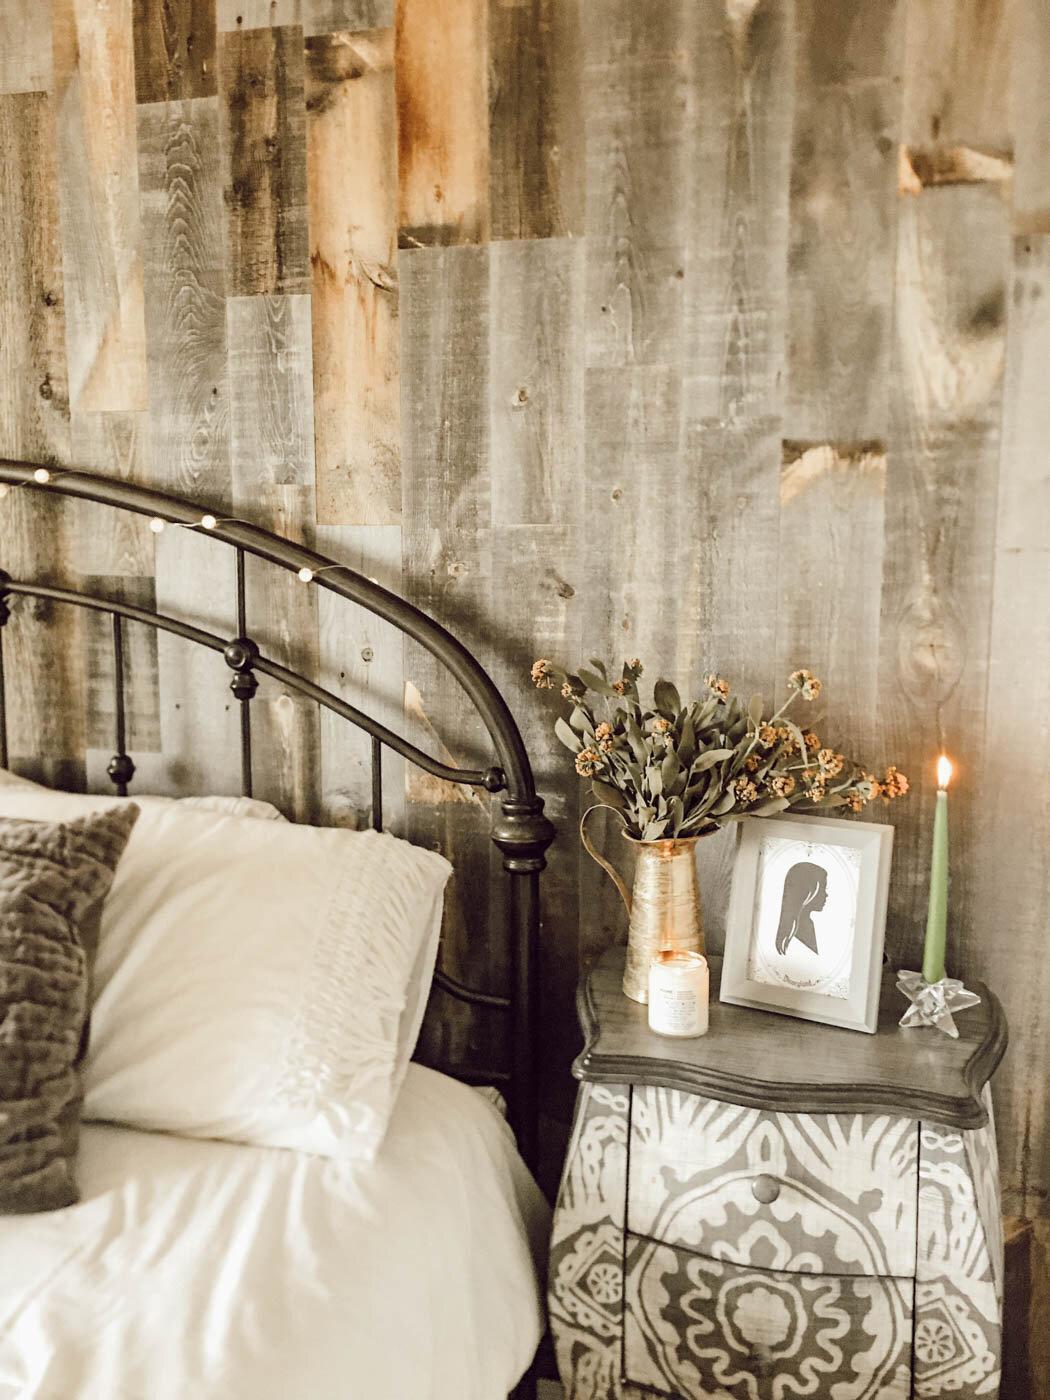 Vintage Cabin 150 Hr Home Studio List